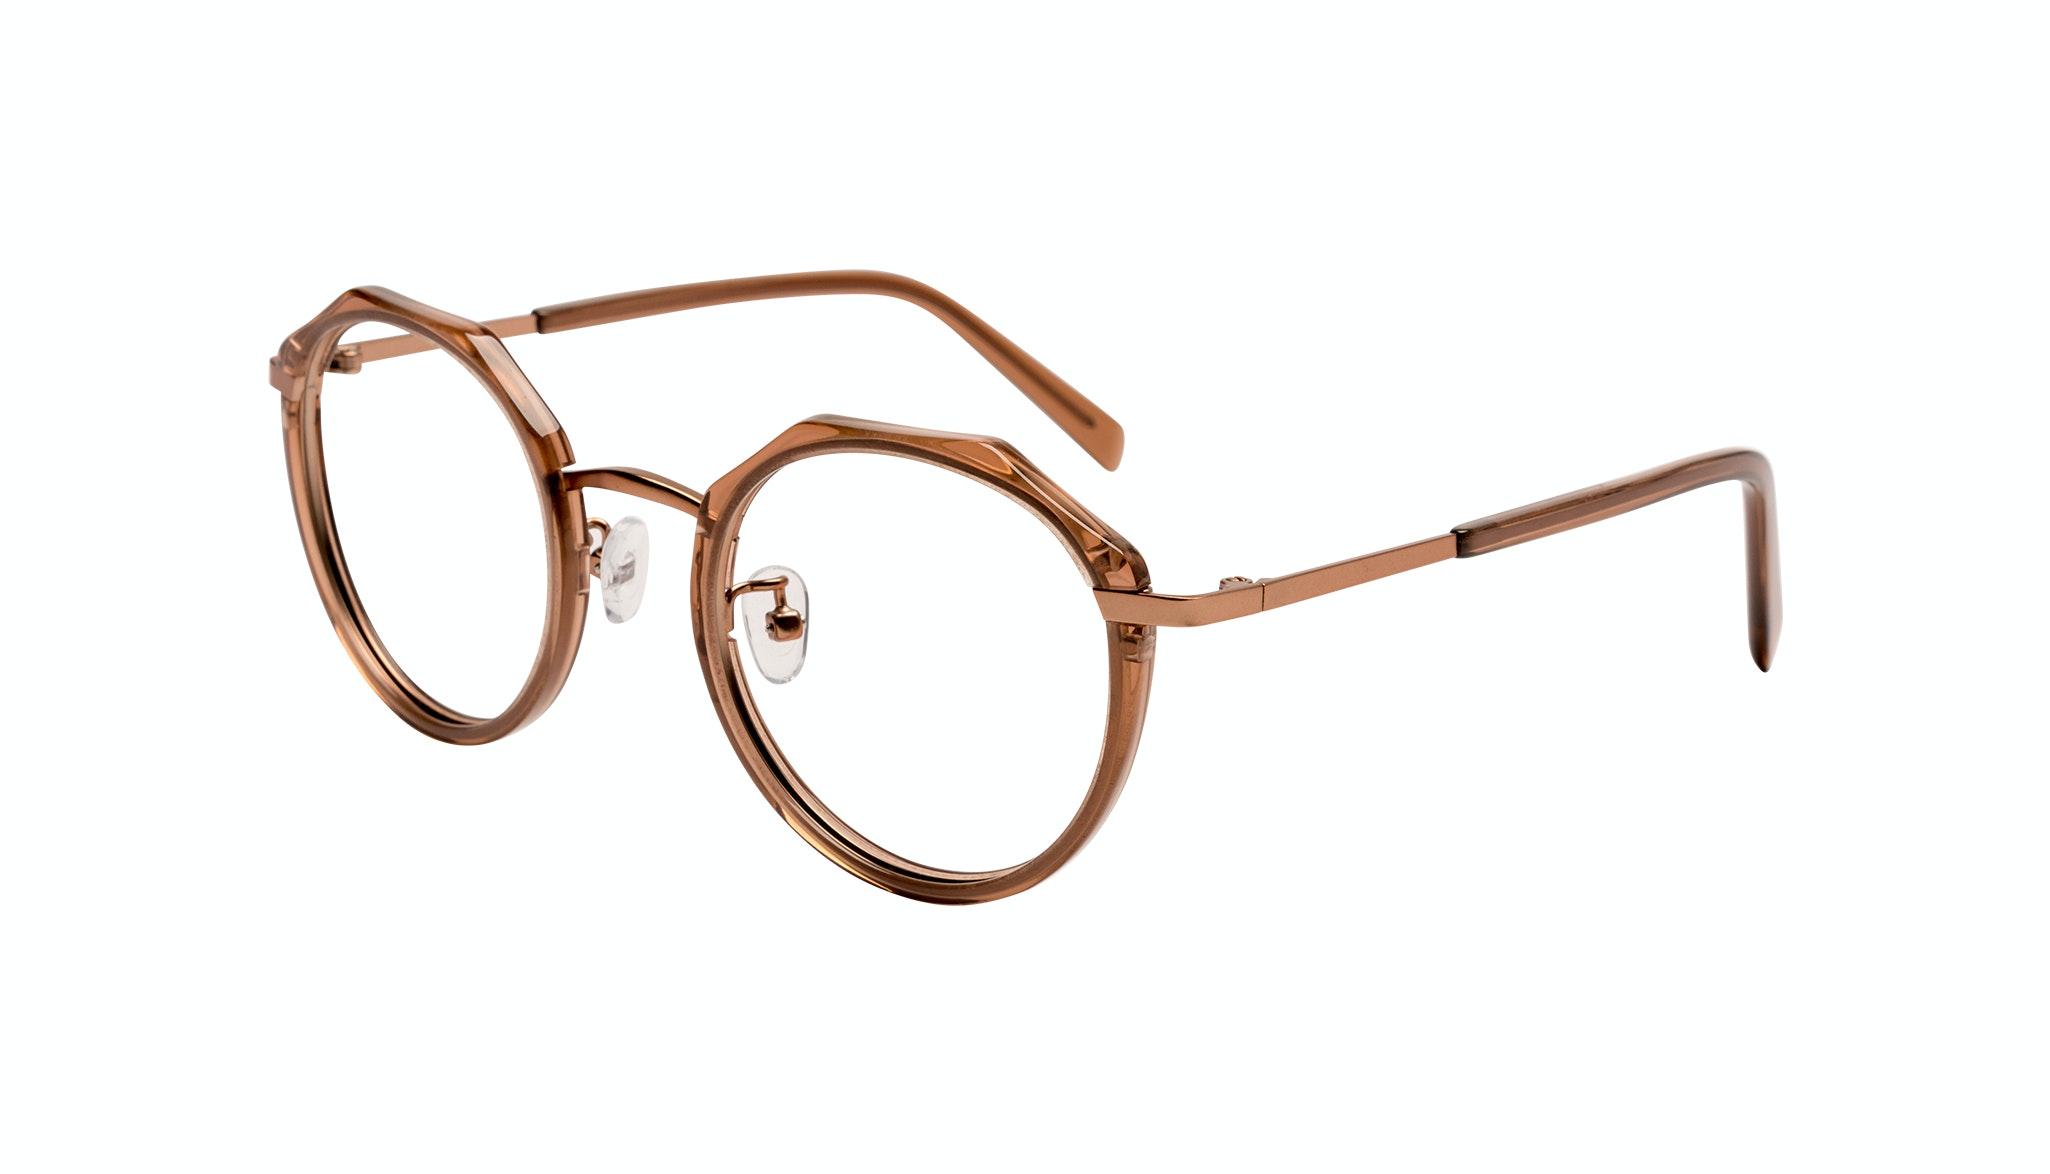 Affordable Fashion Glasses Round Eyeglasses Women Womance Jules Tilt